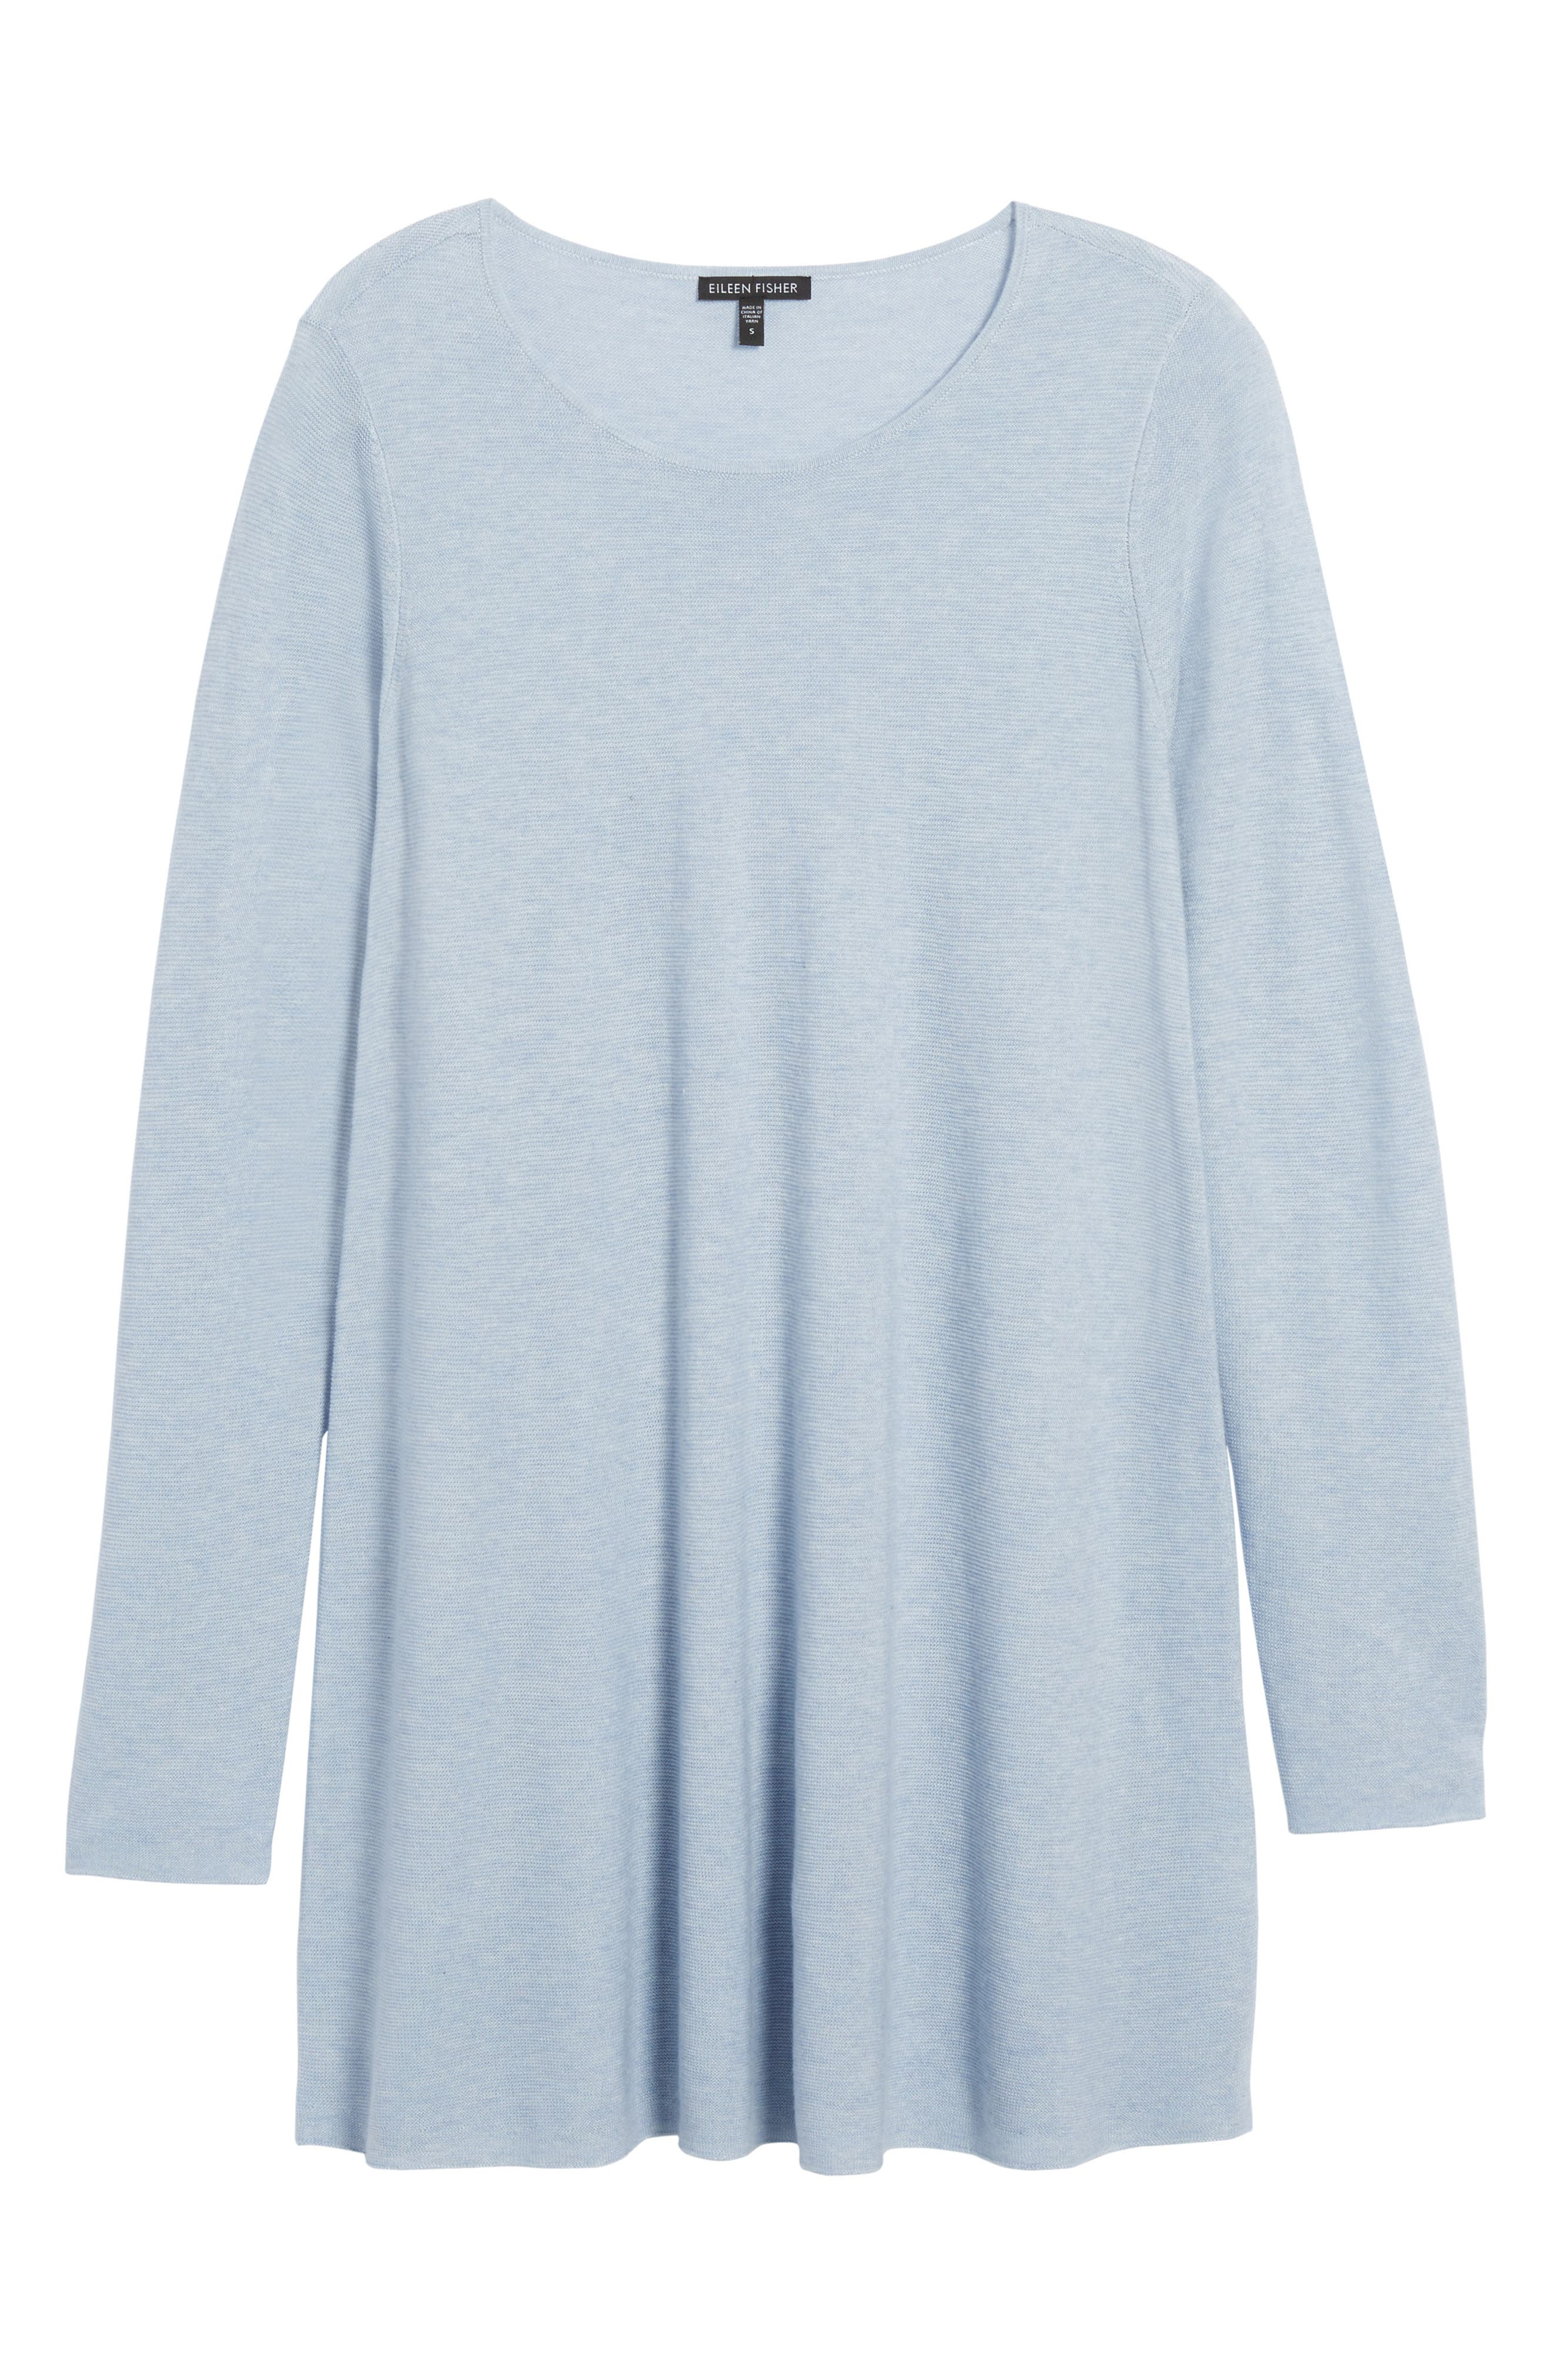 Jewel Neck Tunic Sweater,                             Alternate thumbnail 6, color,                             Delphine